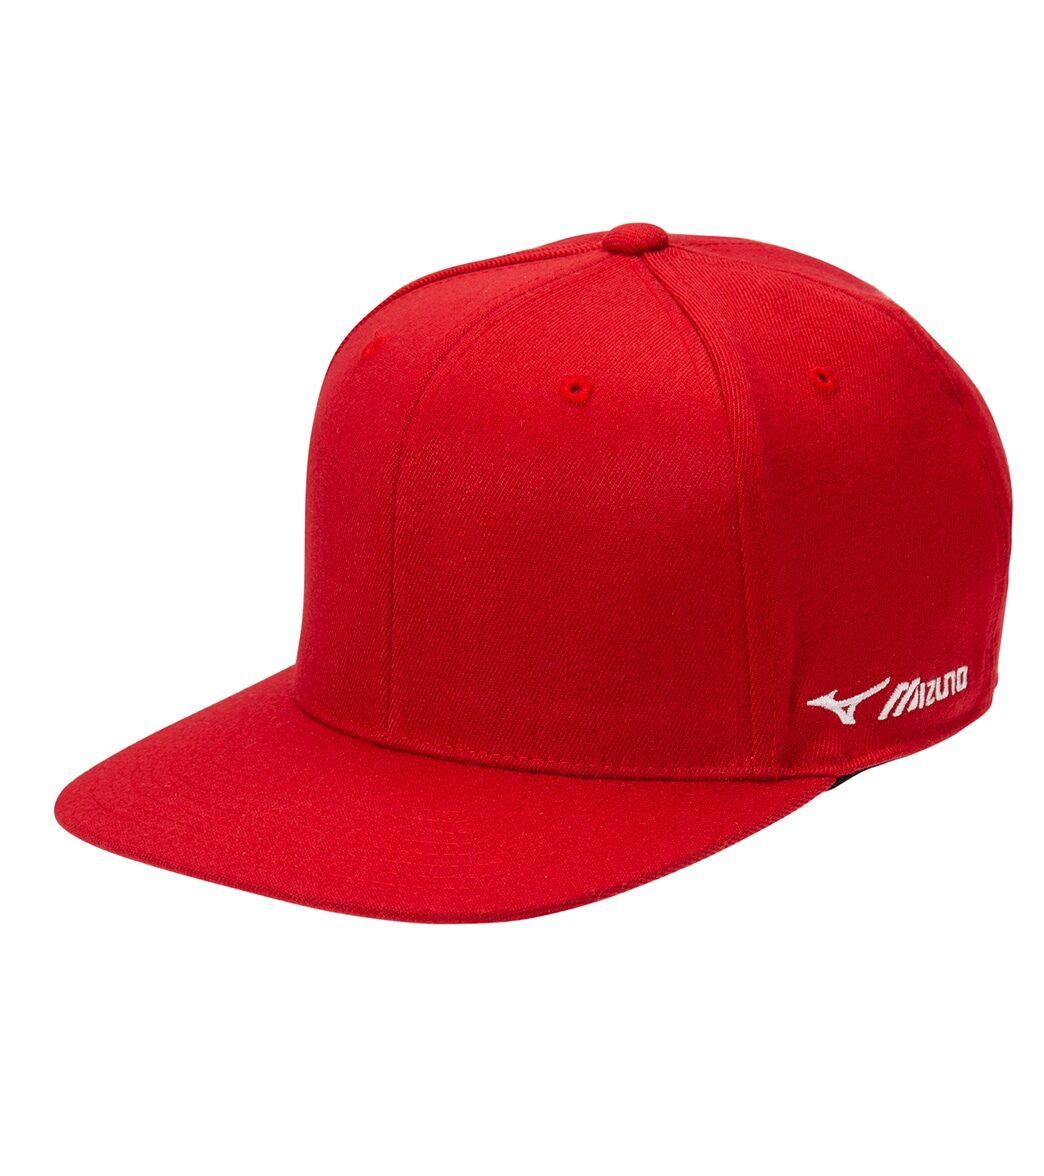 Mizuno Team Snapback Cap - Red - Swimoutlet.com